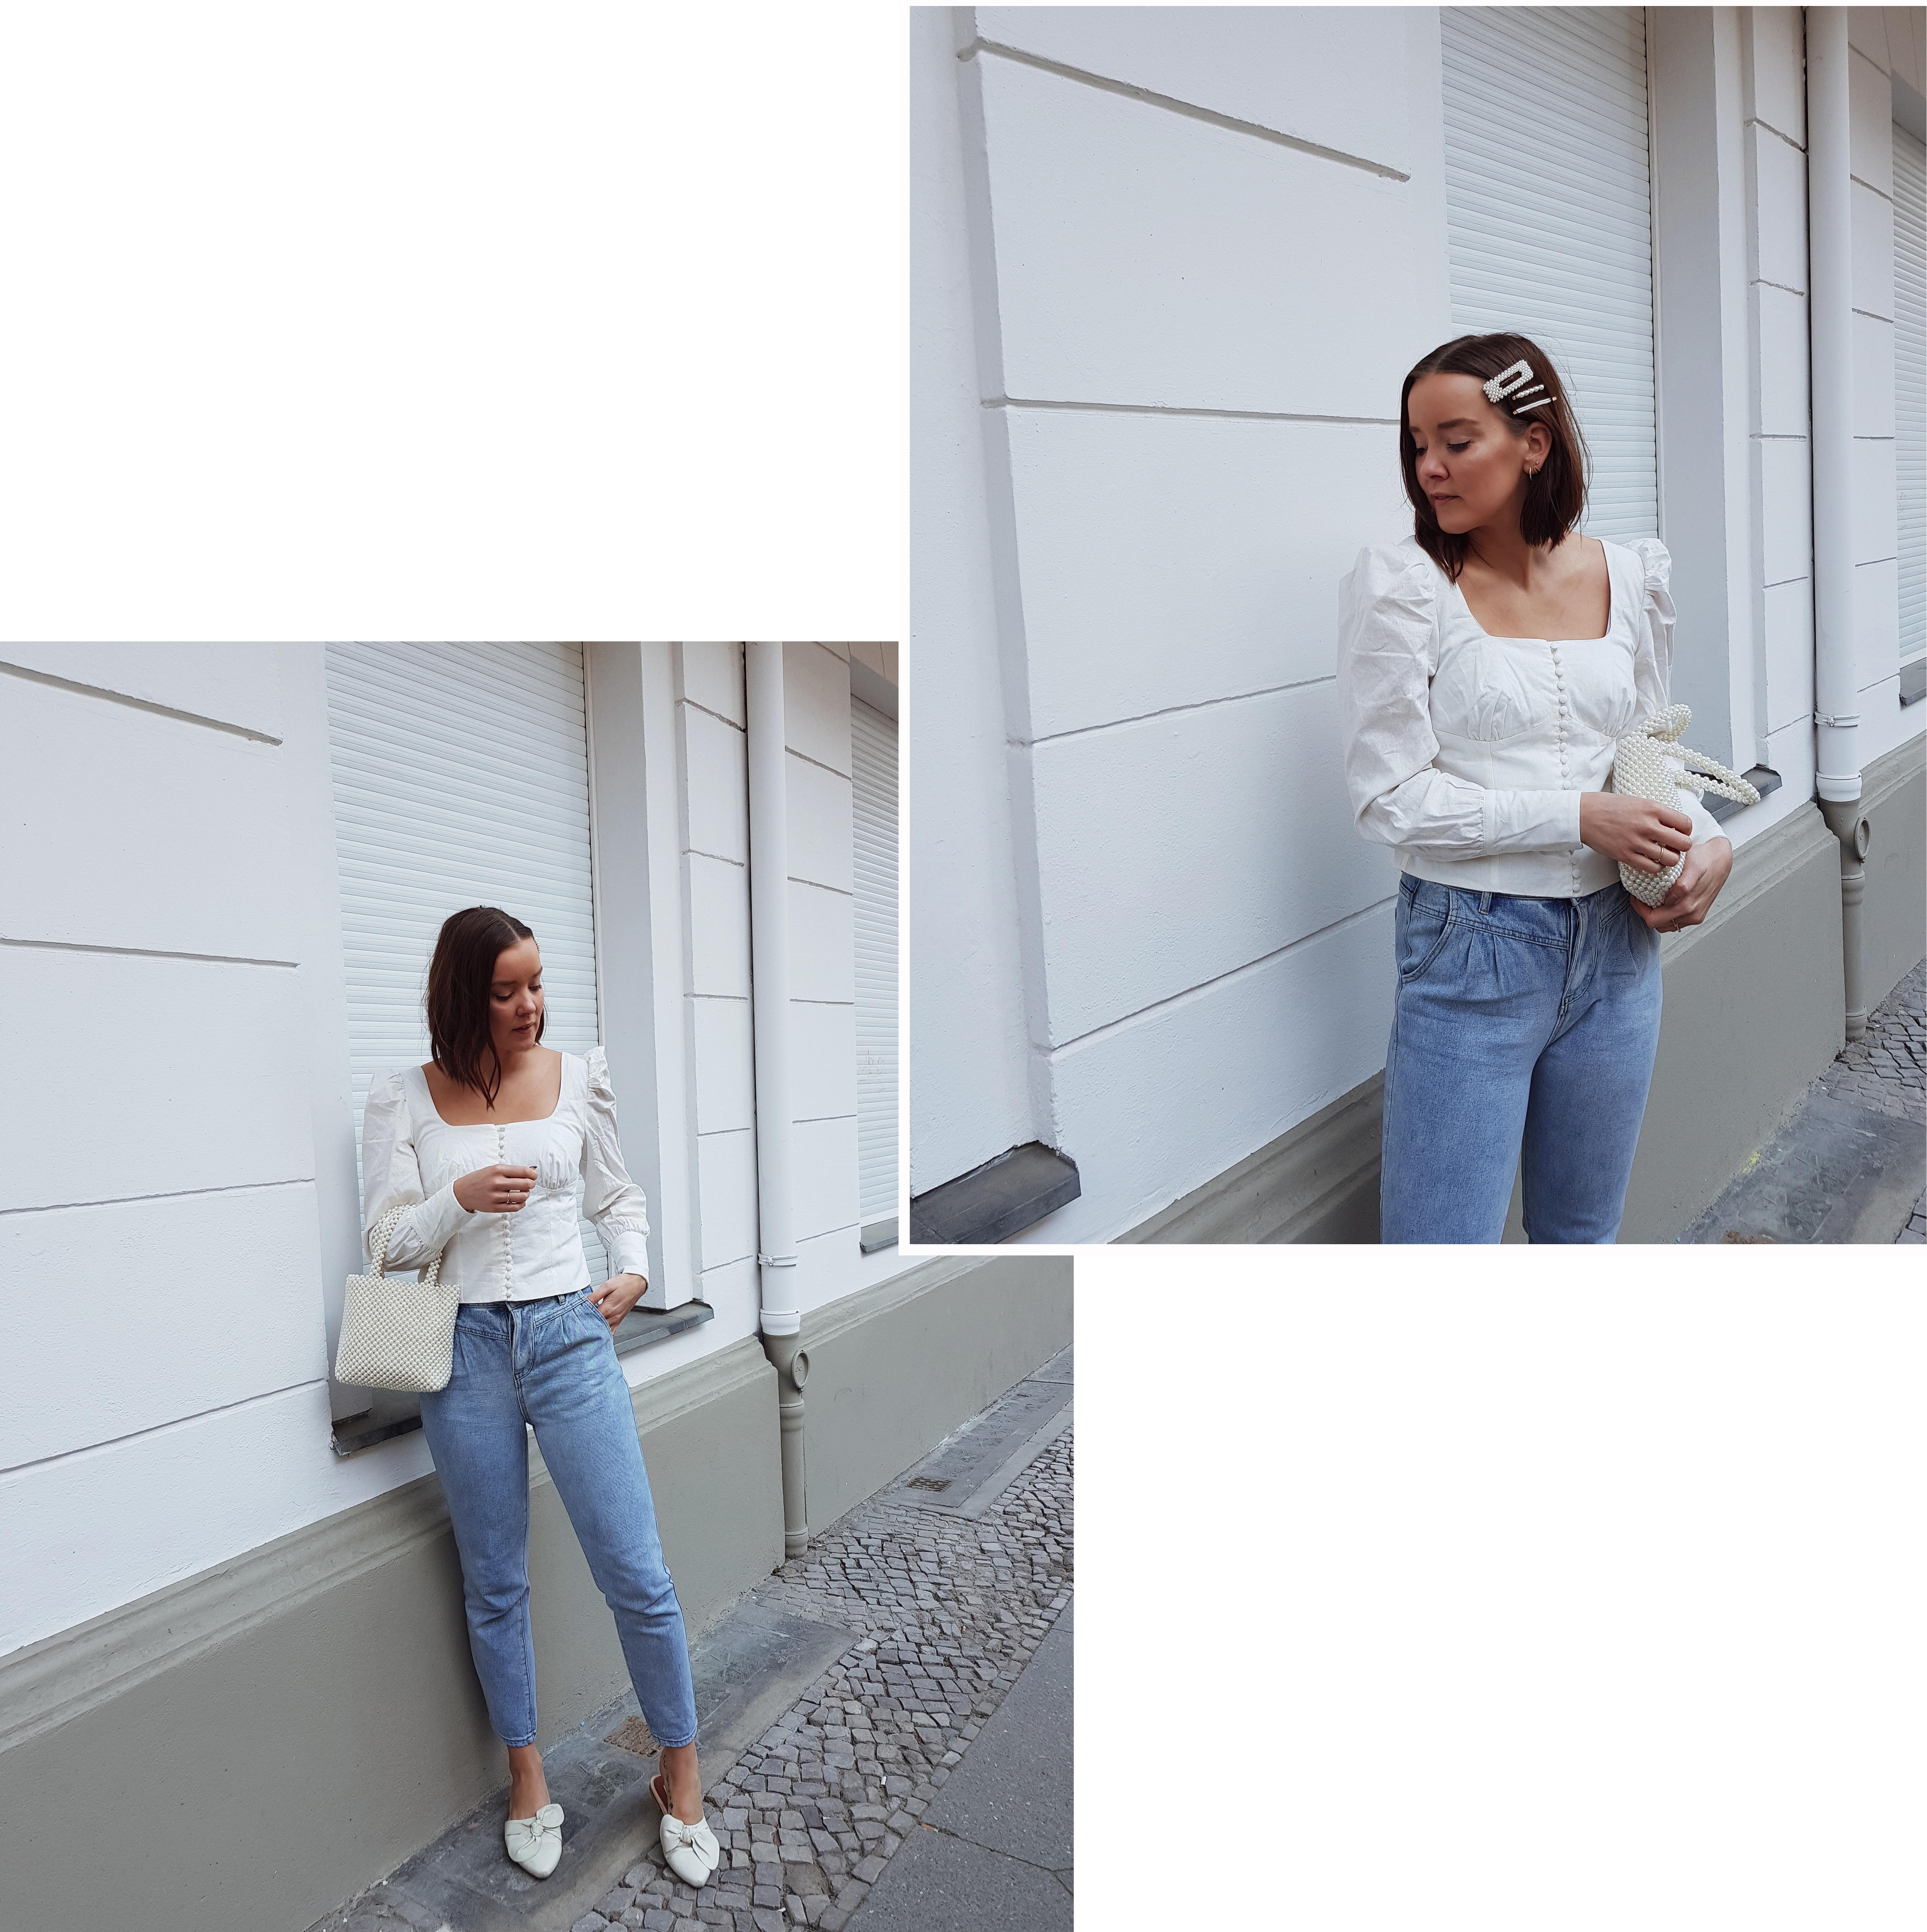 style-appetite-mikro-trends-milkmaid-bluse-perlen-tasche